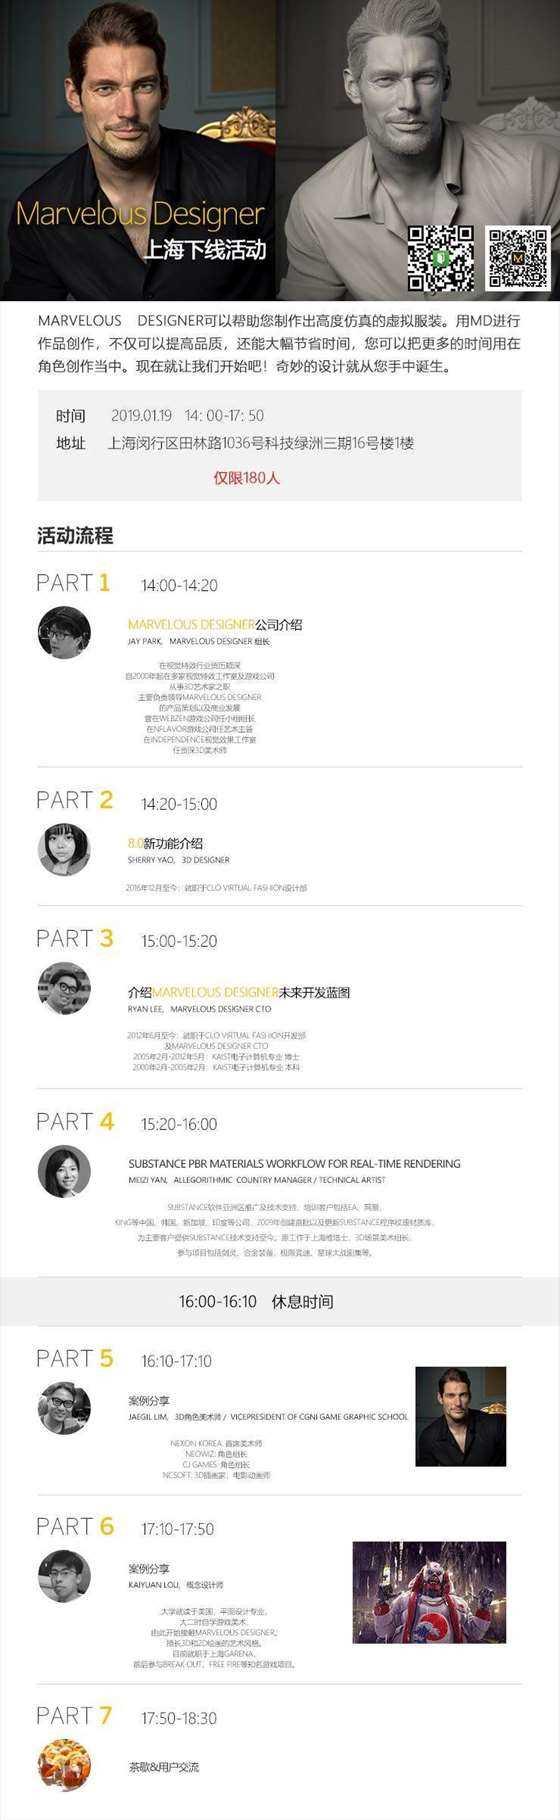 MD_china2019_event.jpg